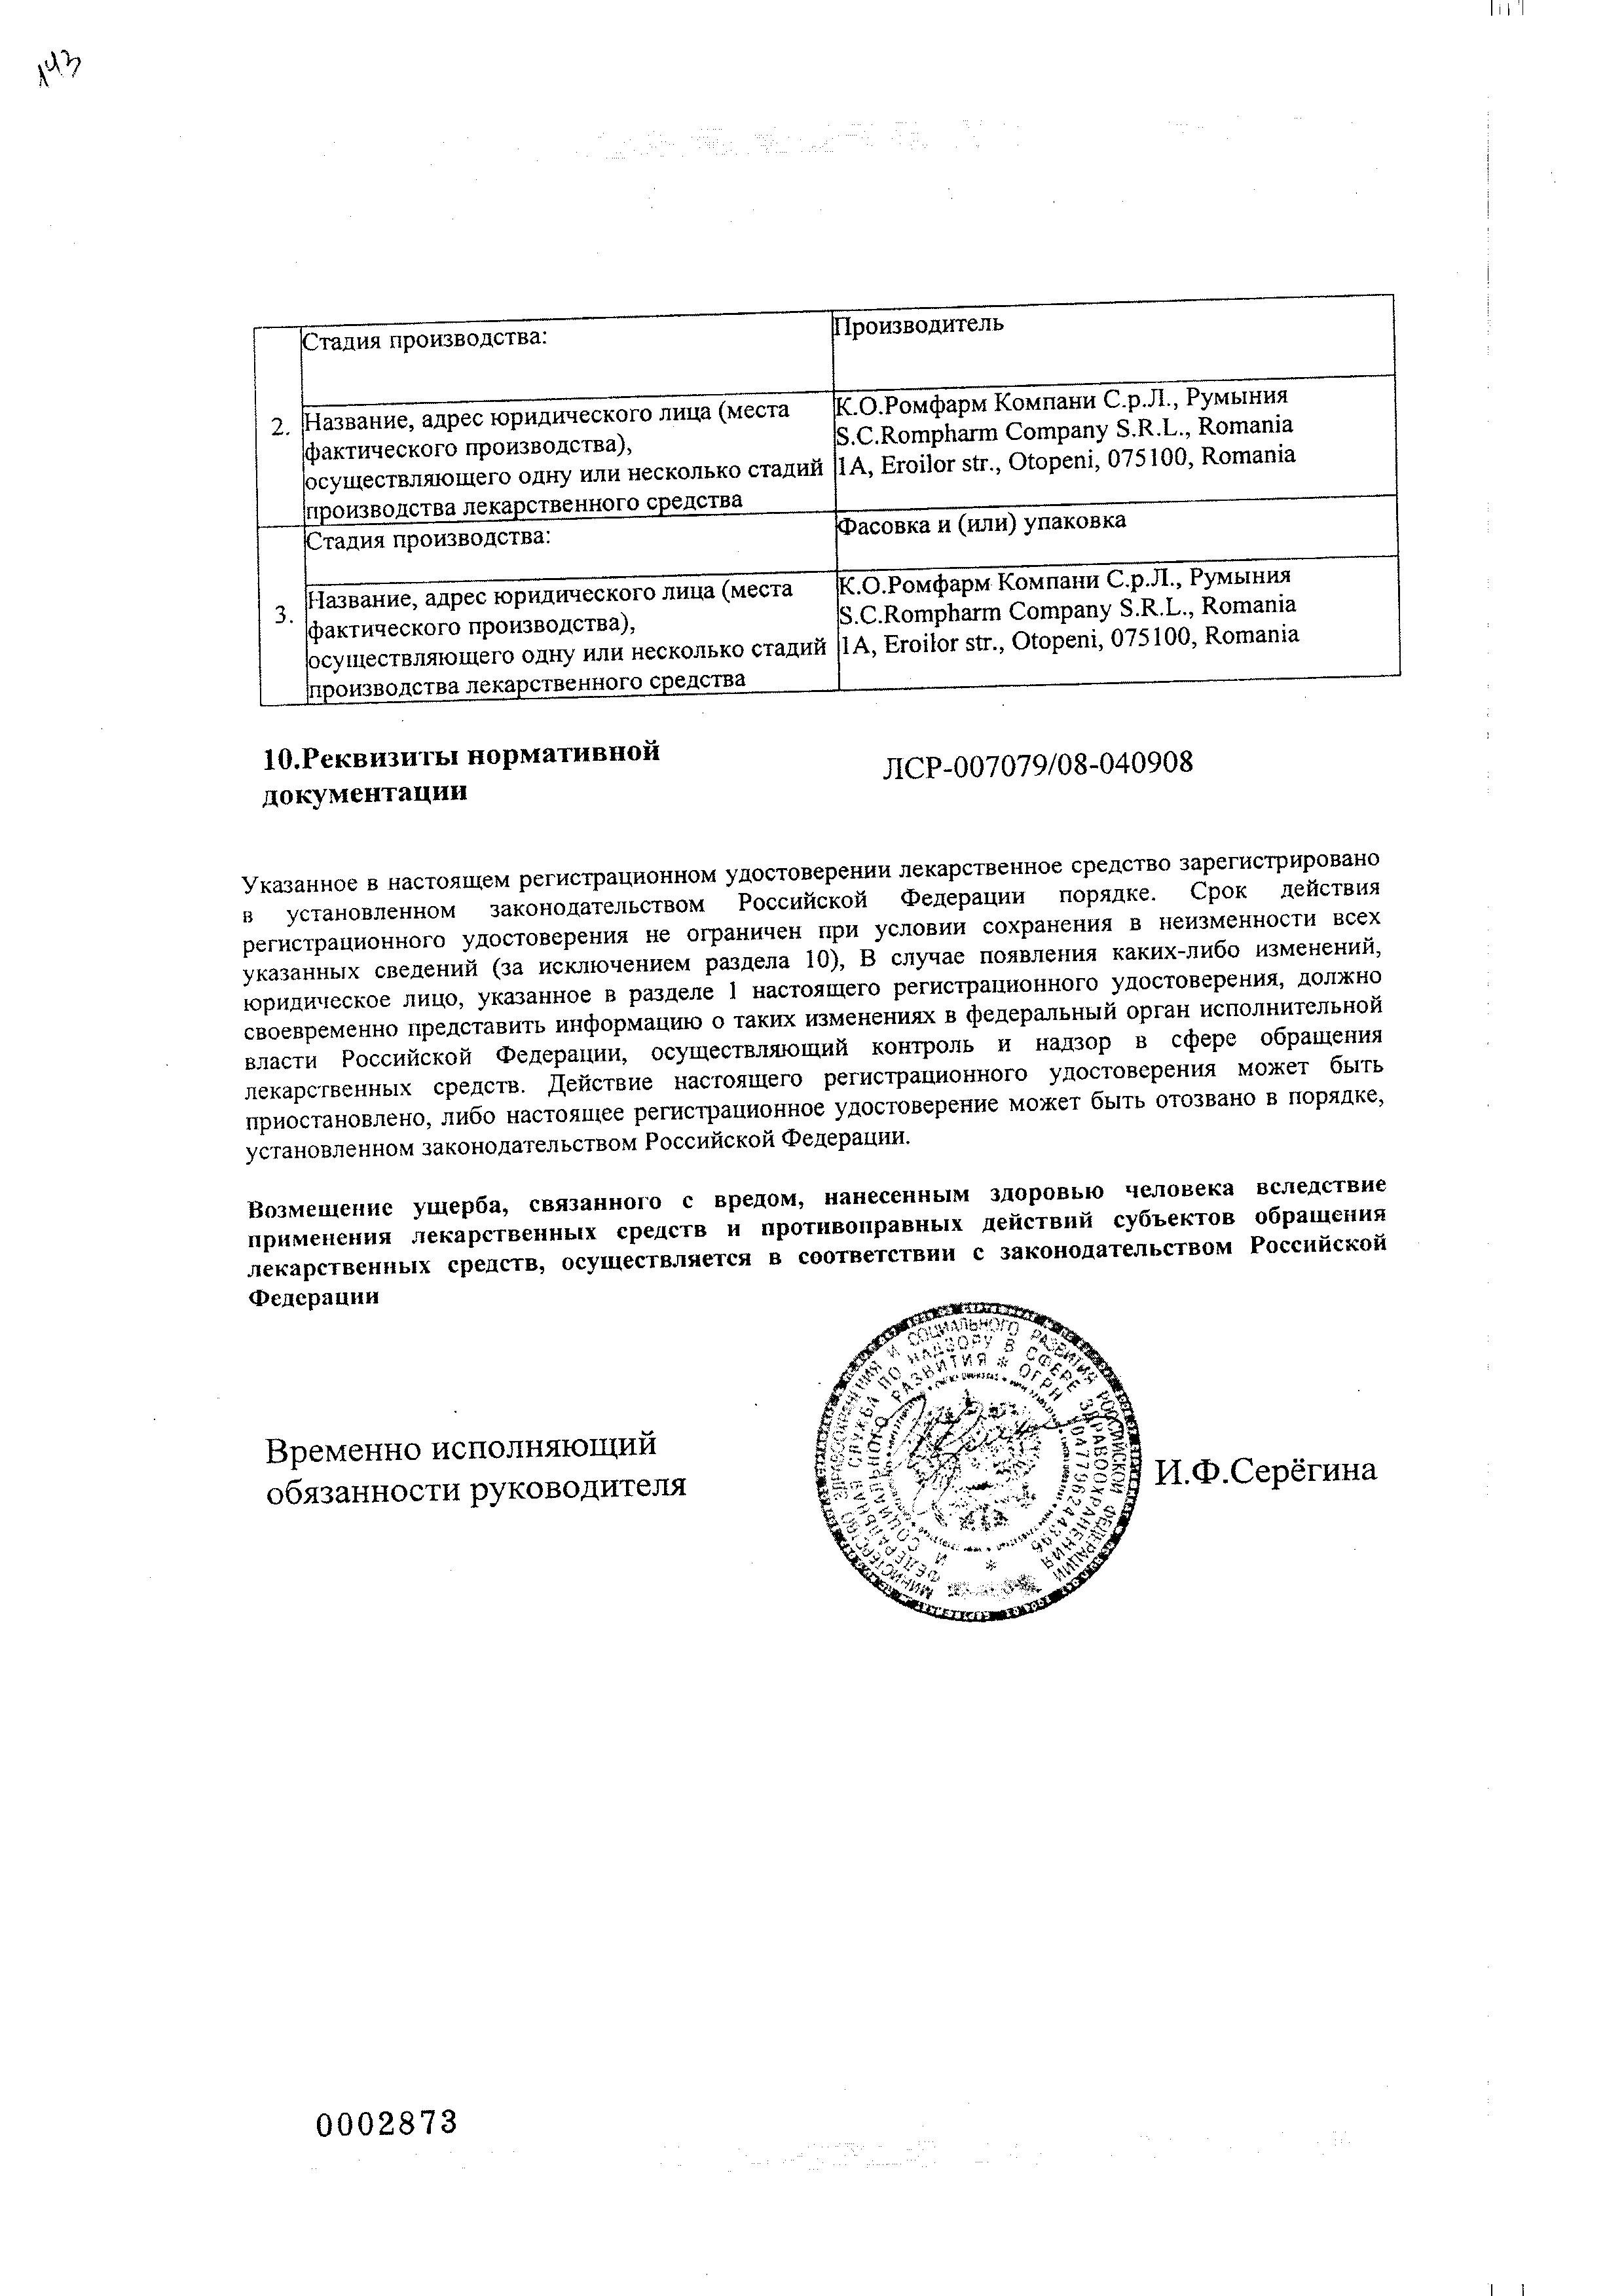 Визоптик сертификат